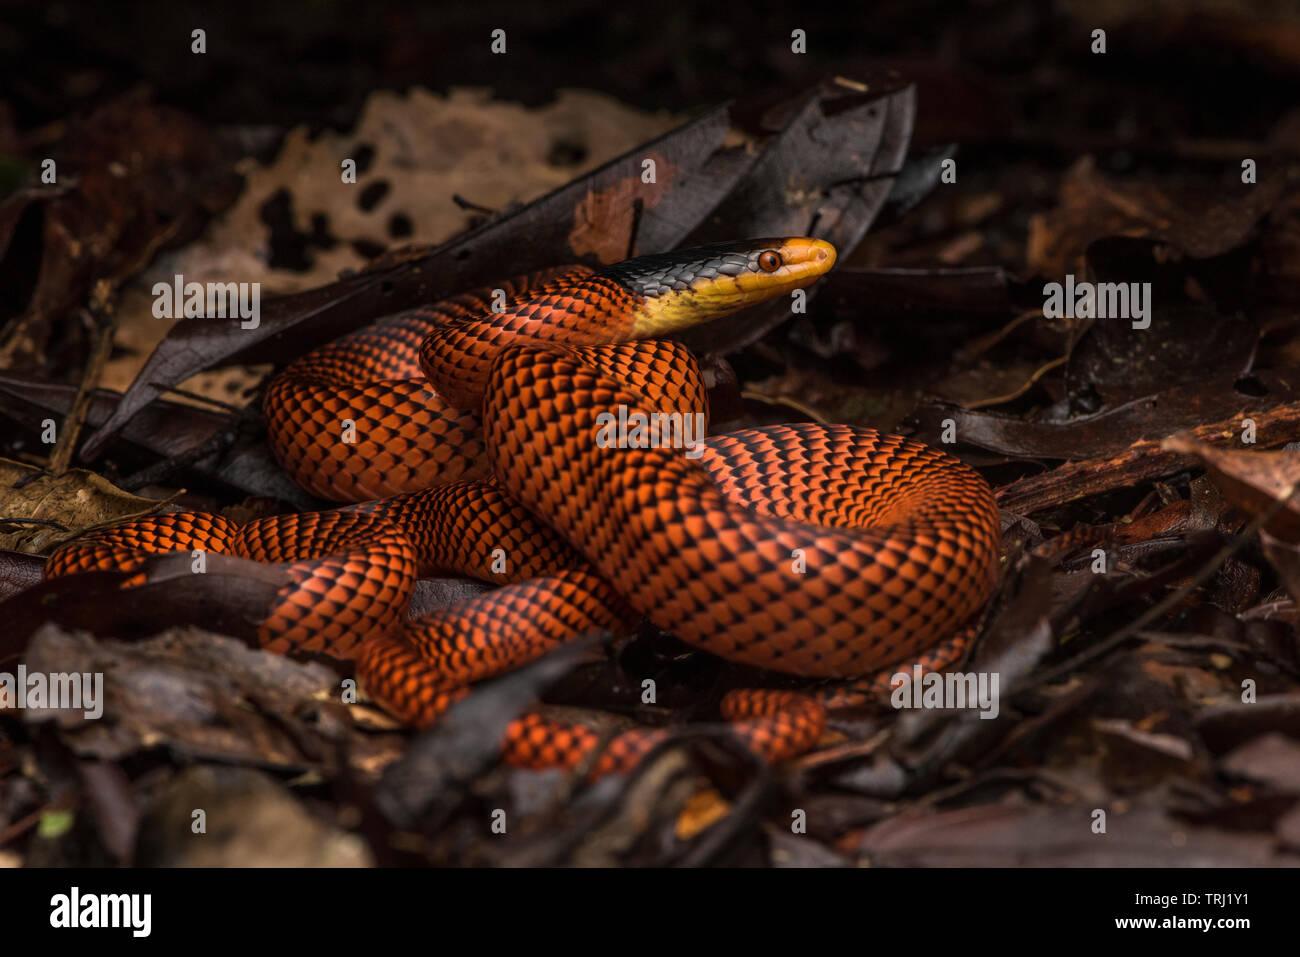 Yellow-headed Calico Snake (Oxyrhopus formosus) a beautiful snake from Ecuador's Yasuni national park in the Amazon jungle. Stock Photo